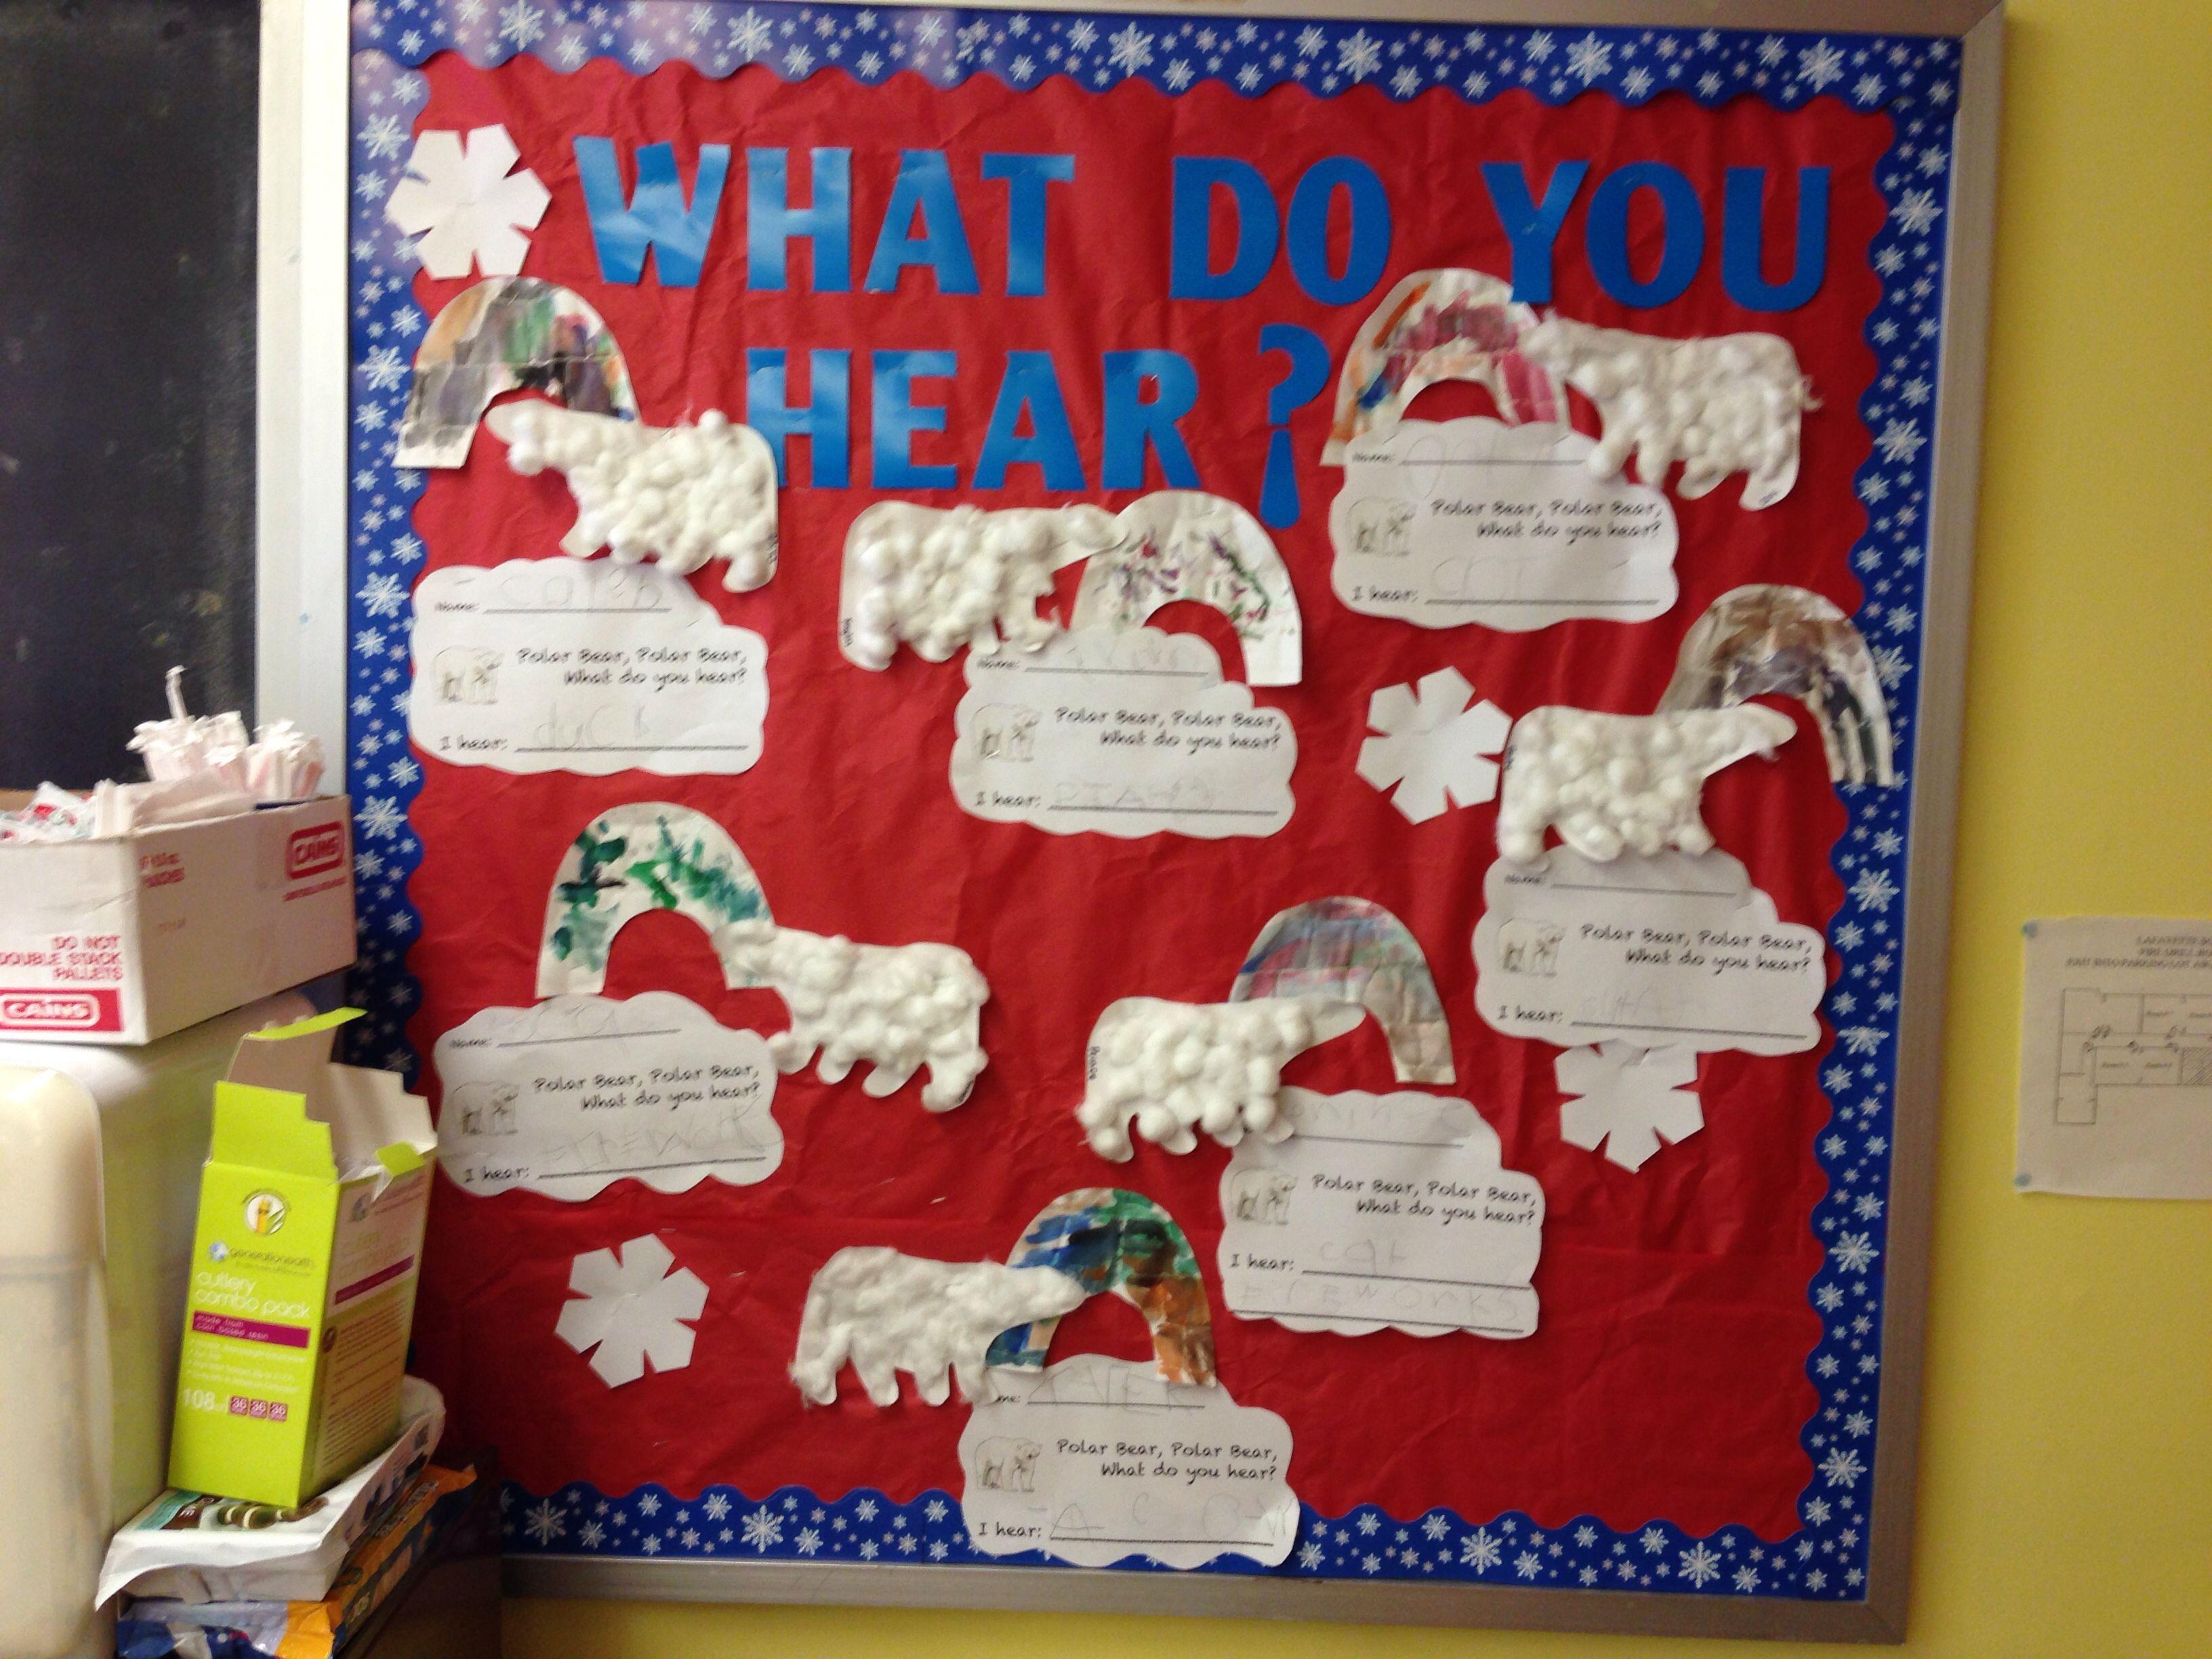 Bulletin Board To Go With Book Polar Bear Polar Bear